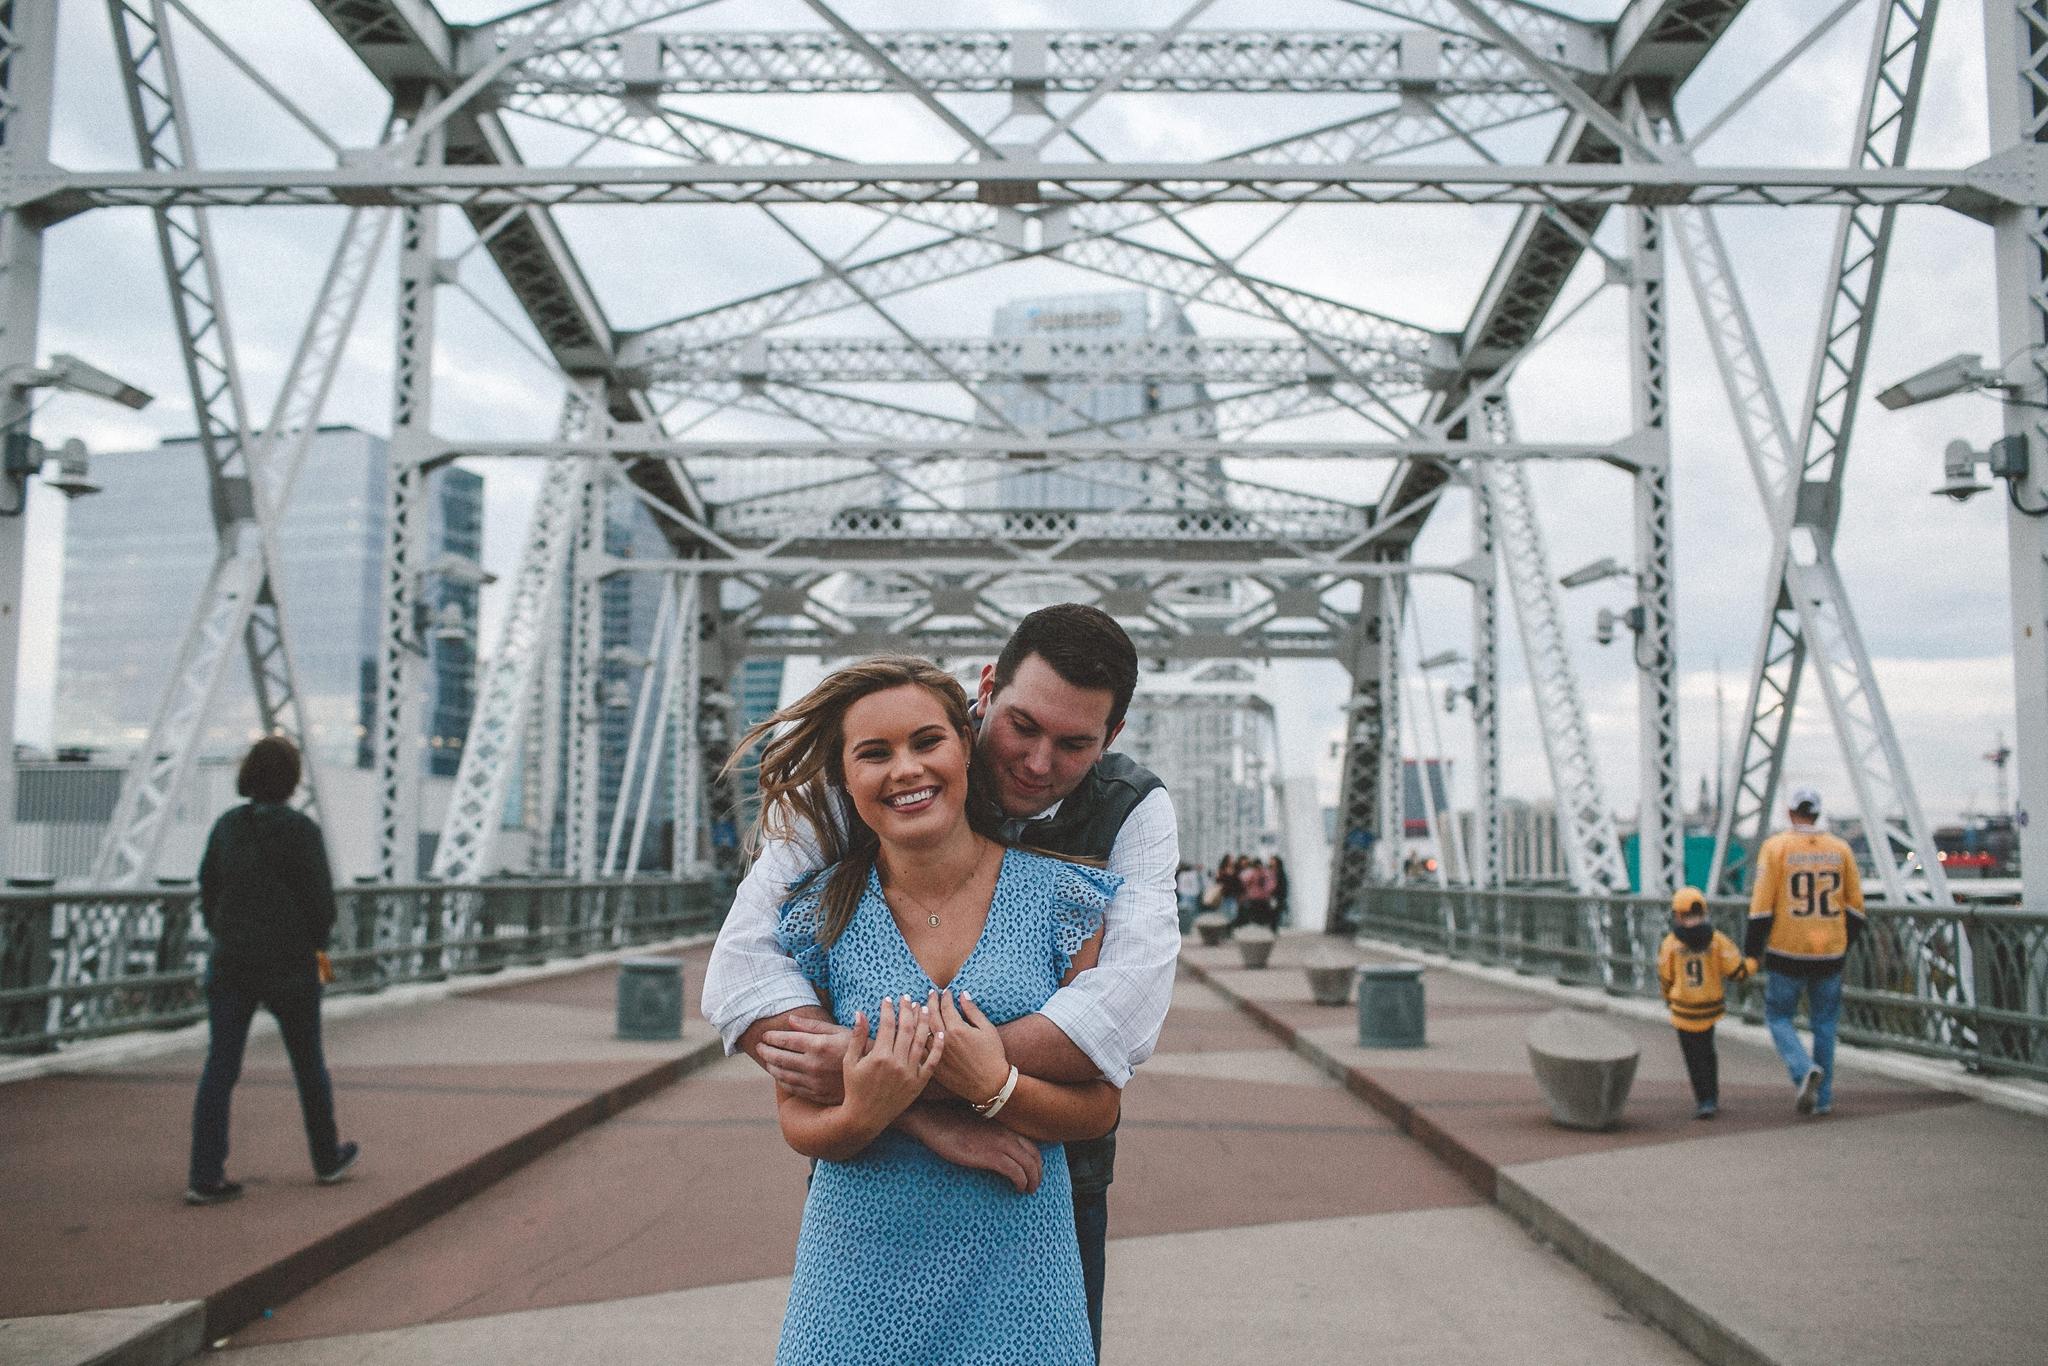 nashville_pedestrian_bridge_mural_engagement_photograper_0012.jpg